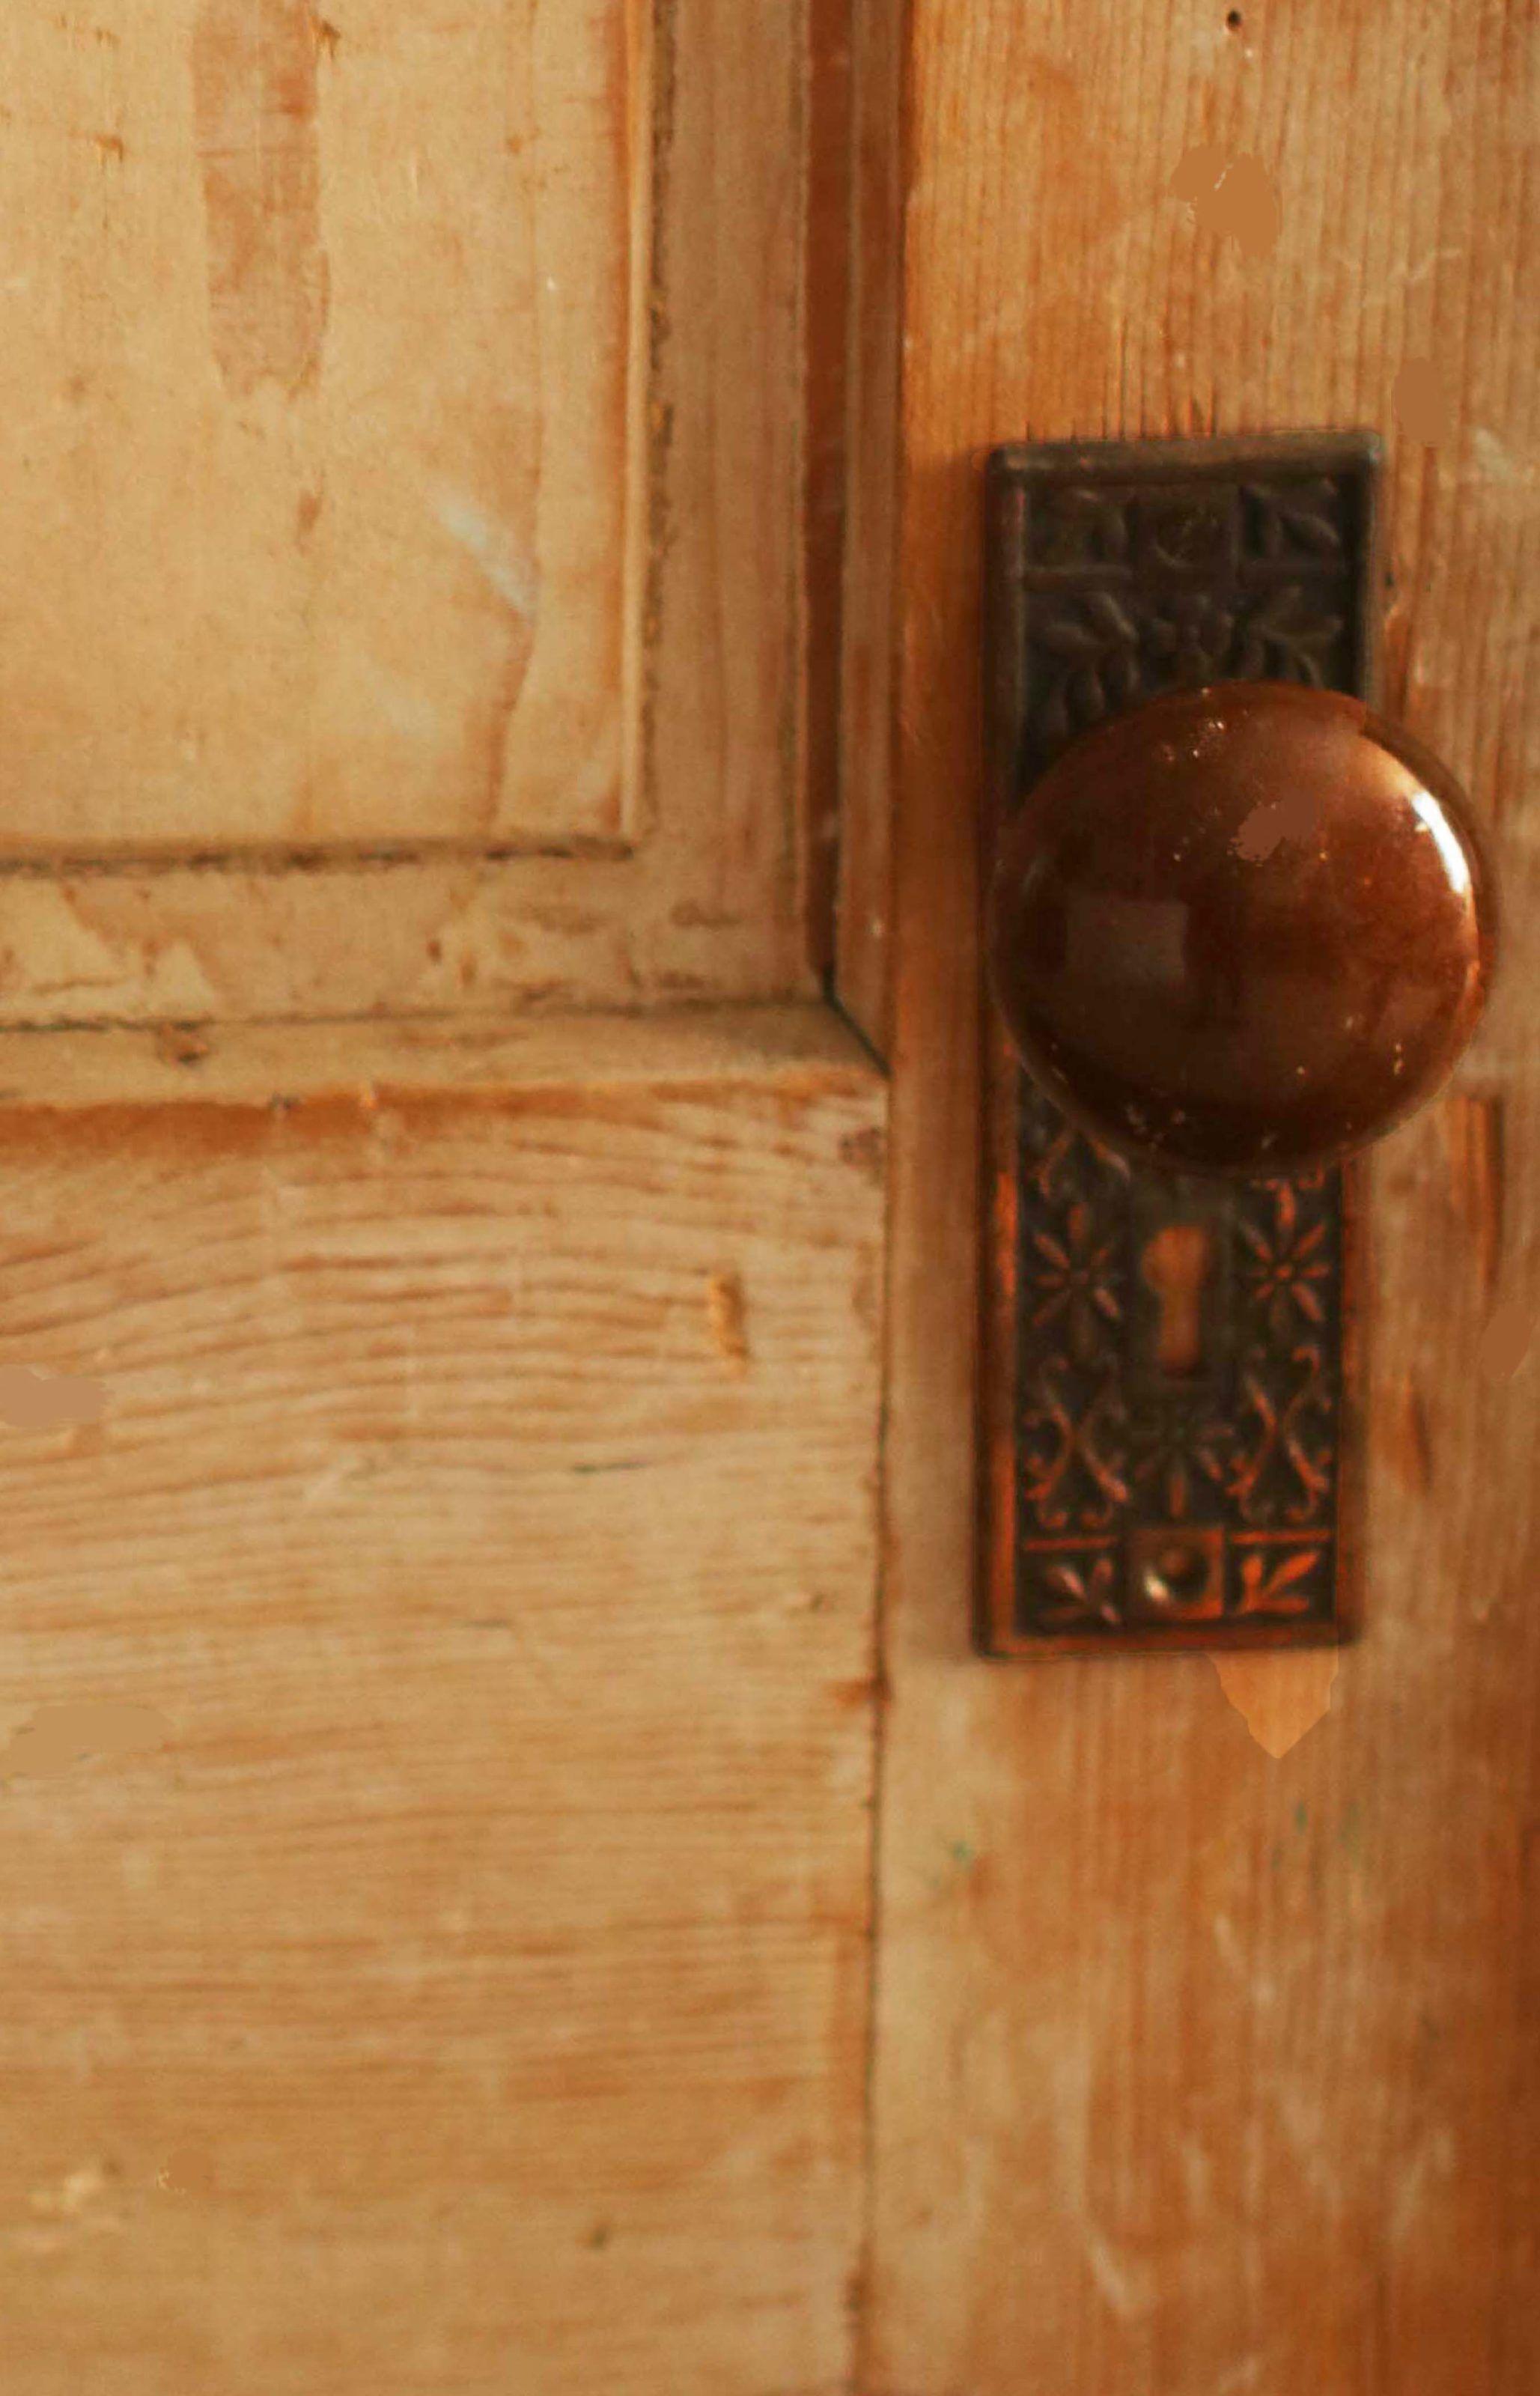 Repurpose Old Wood Doors Diy Tips And Tricks Old Wood Doors